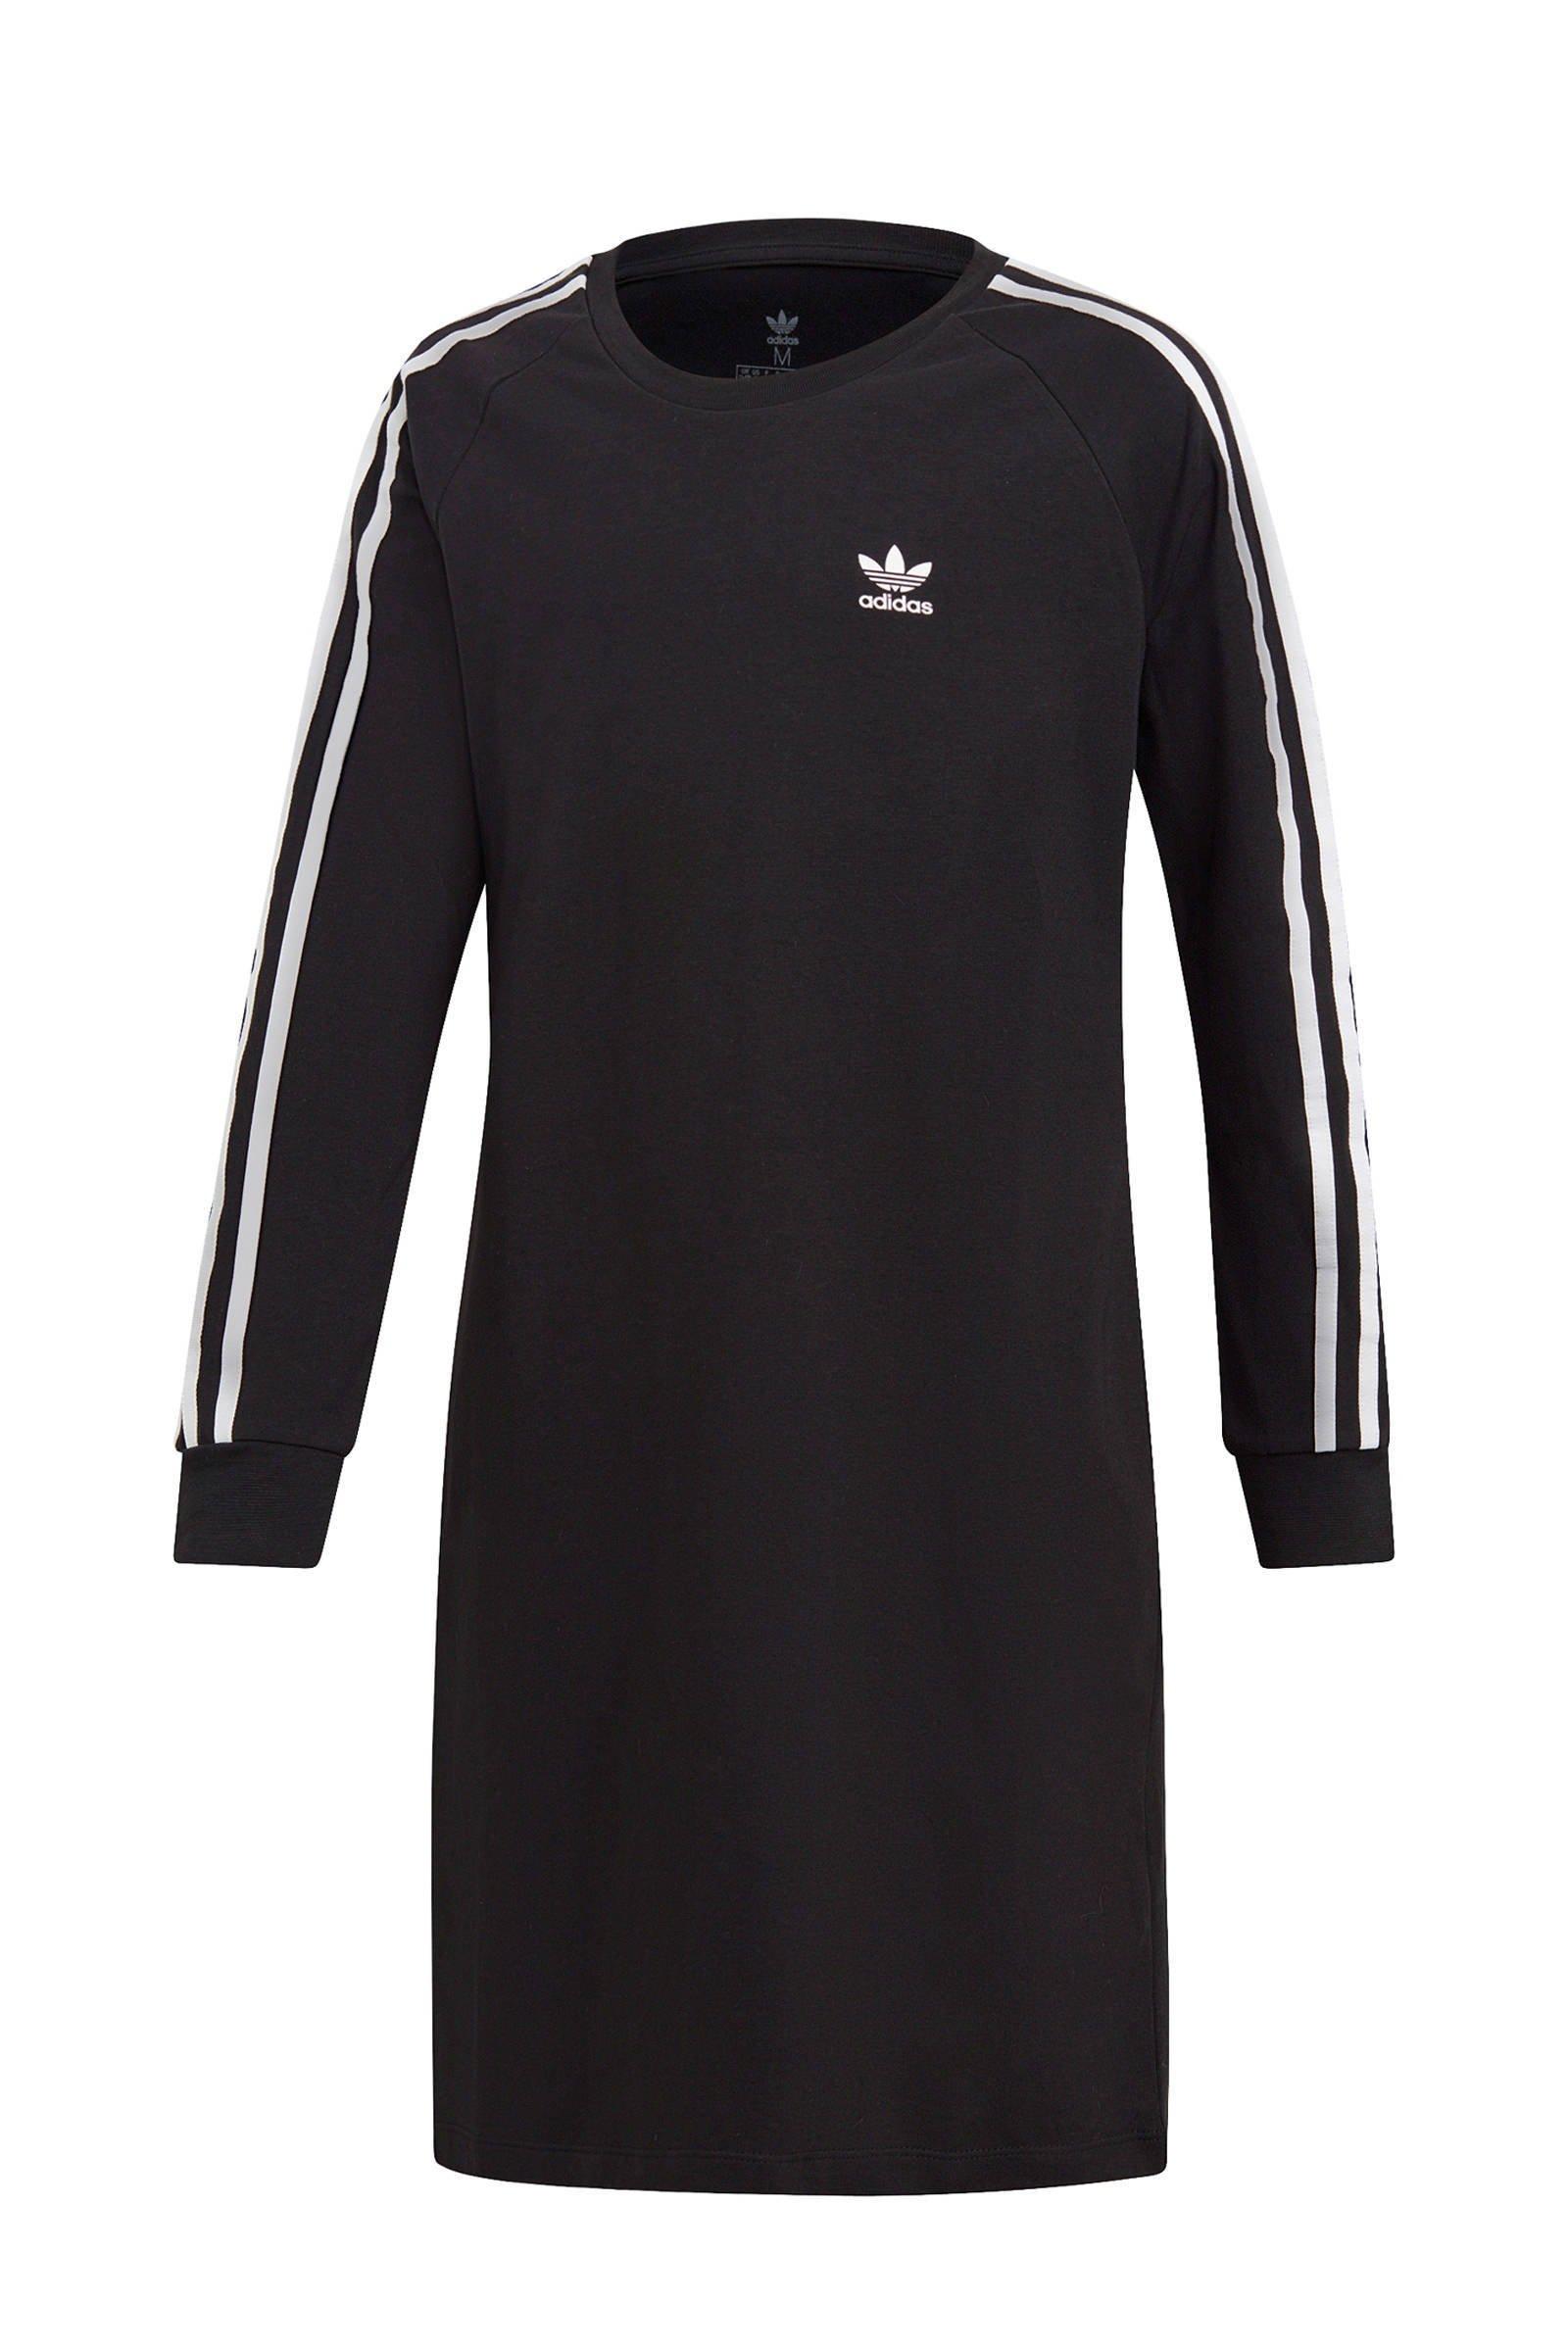 adidas Originals sweatjurk zwart | wehkamp